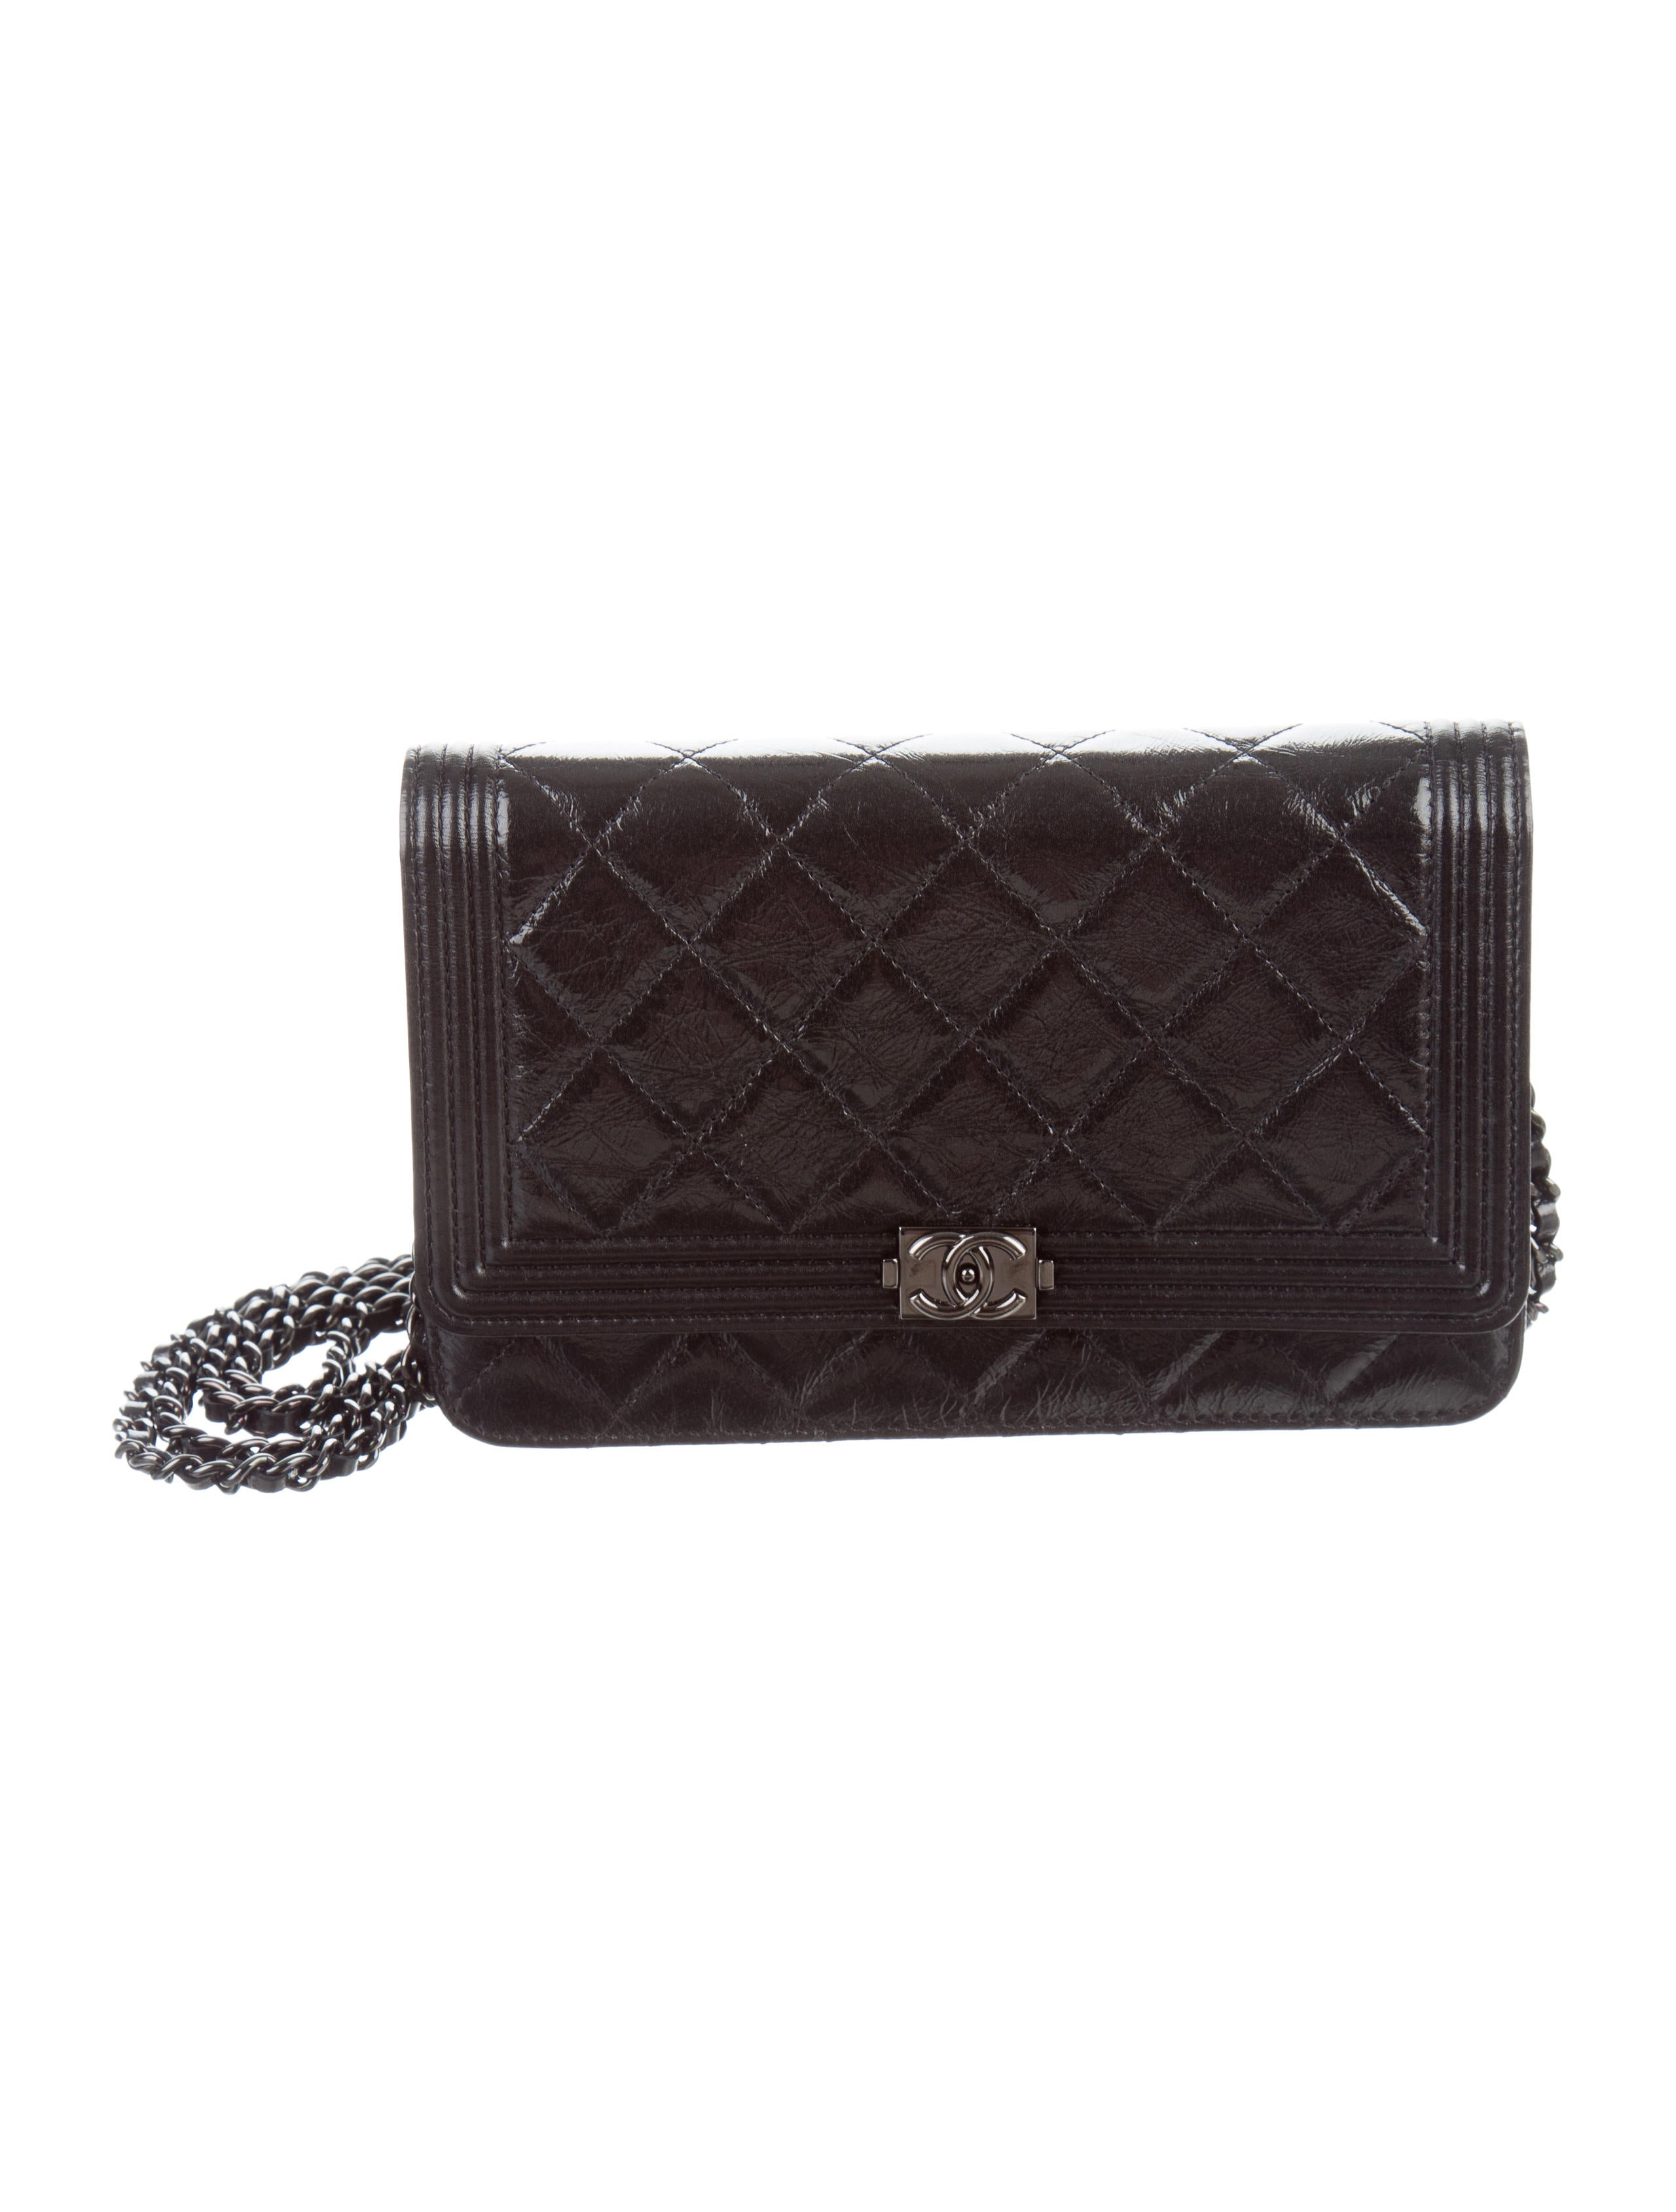 Chanel Boy Wallet On Chain Handbags Cha183916 The